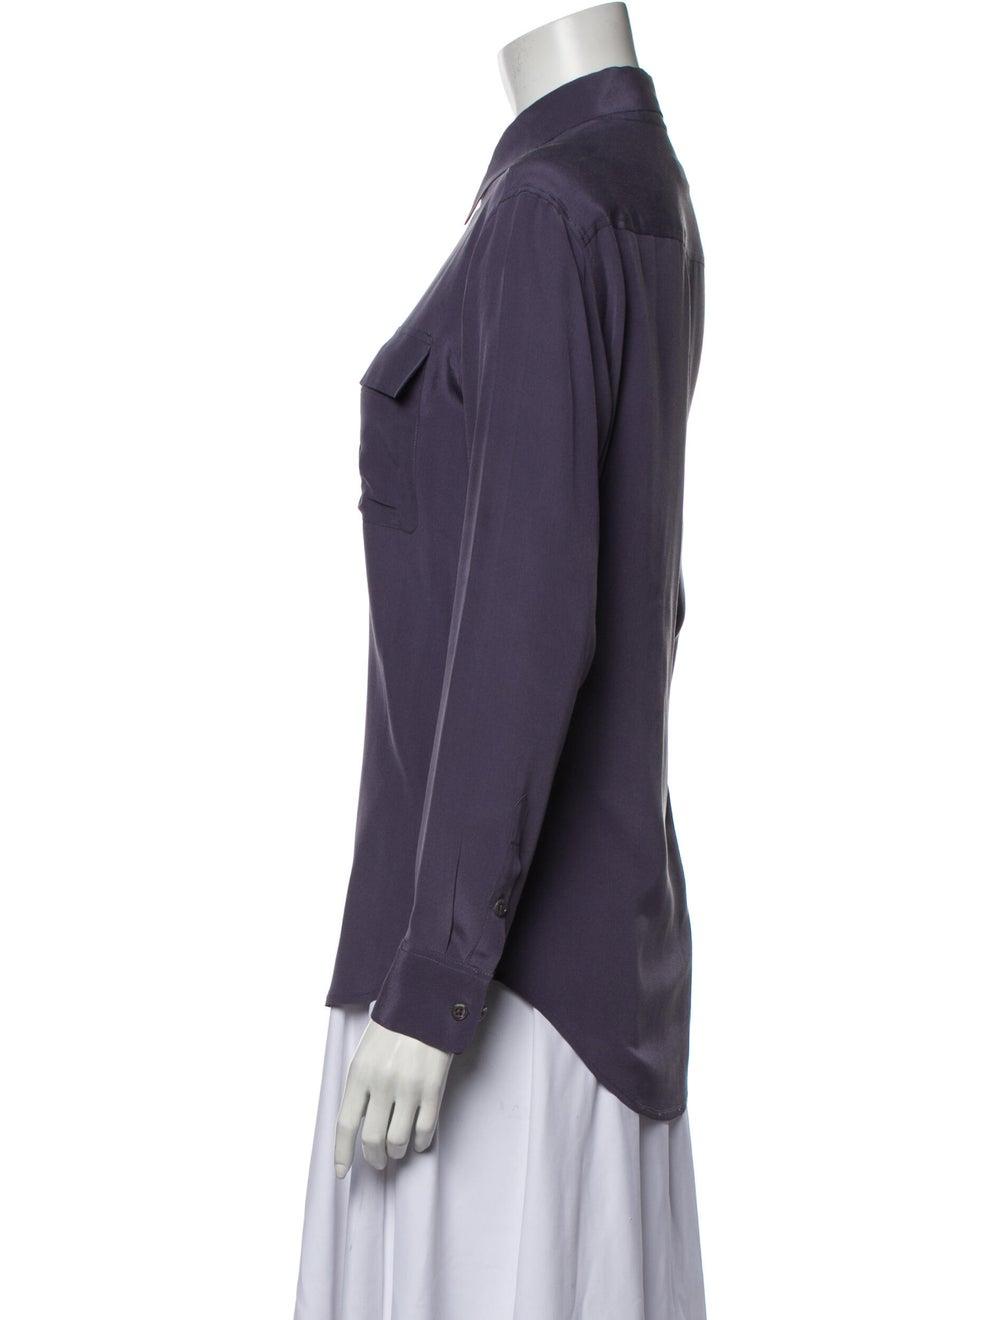 Equipment Silk Long Sleeve Button-Up Top Purple - image 2